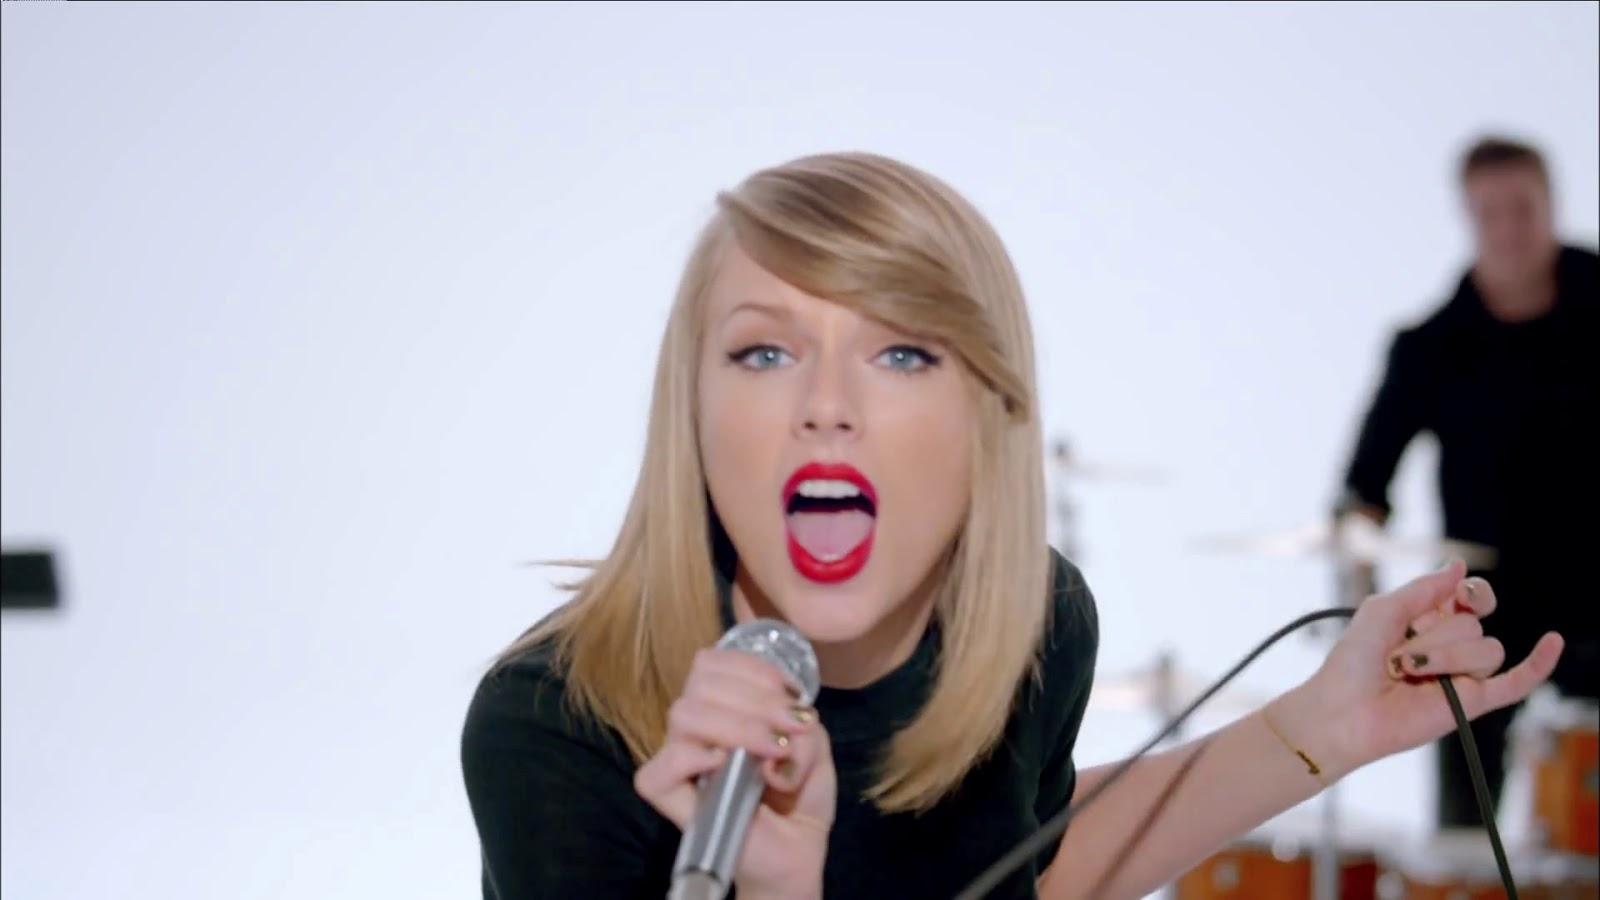 Beautiful American Singer Taylor Swift Wallpaper HD